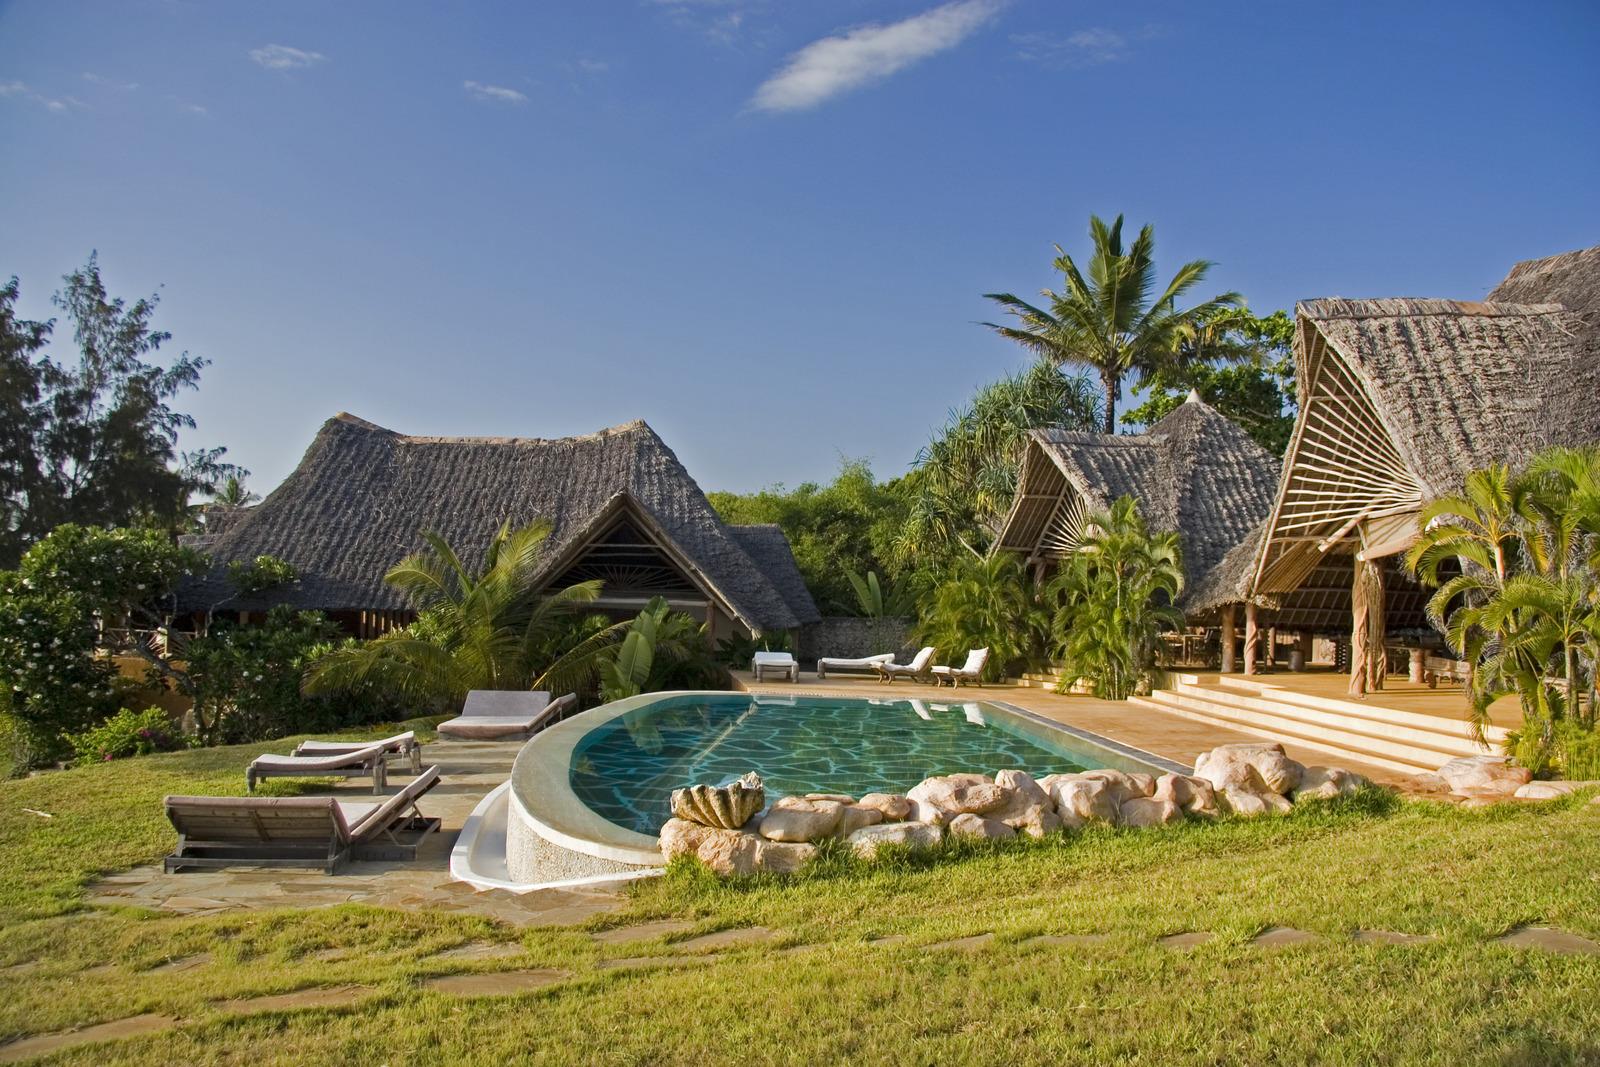 Hotel alberghi e resort in kenya for Le piu belle ville